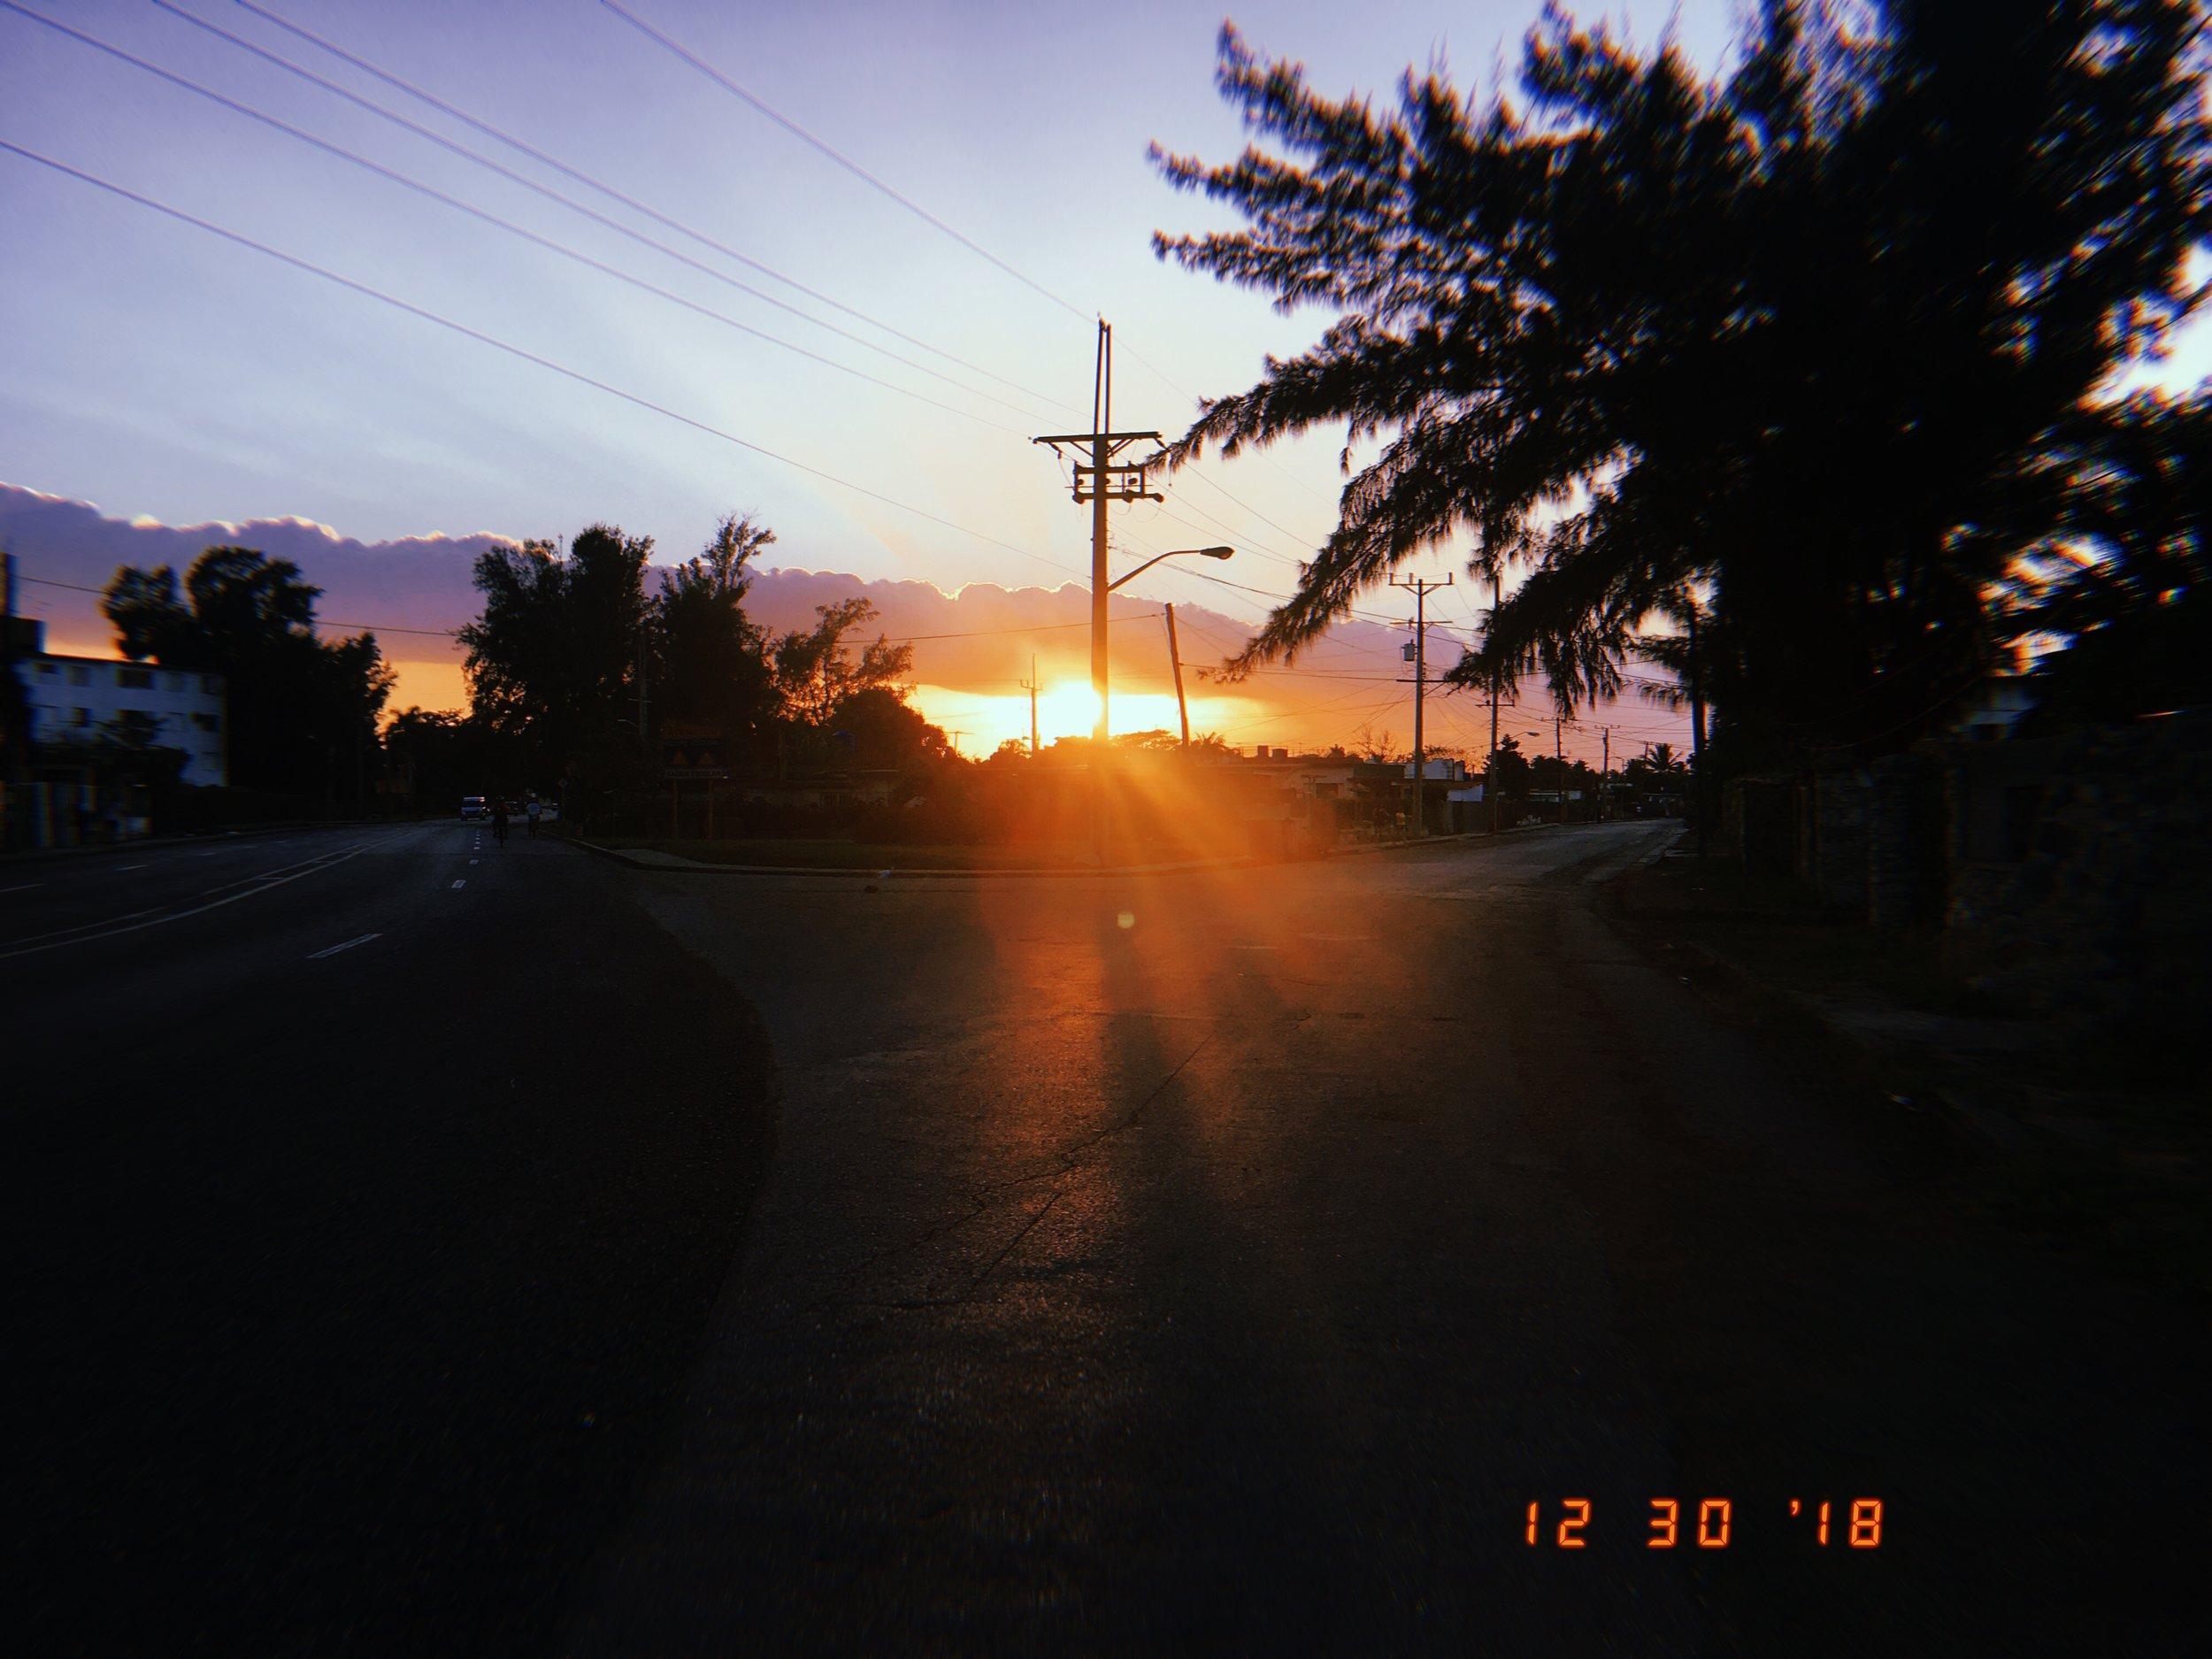 Sunset on 5tra in Santa Fe, Playa